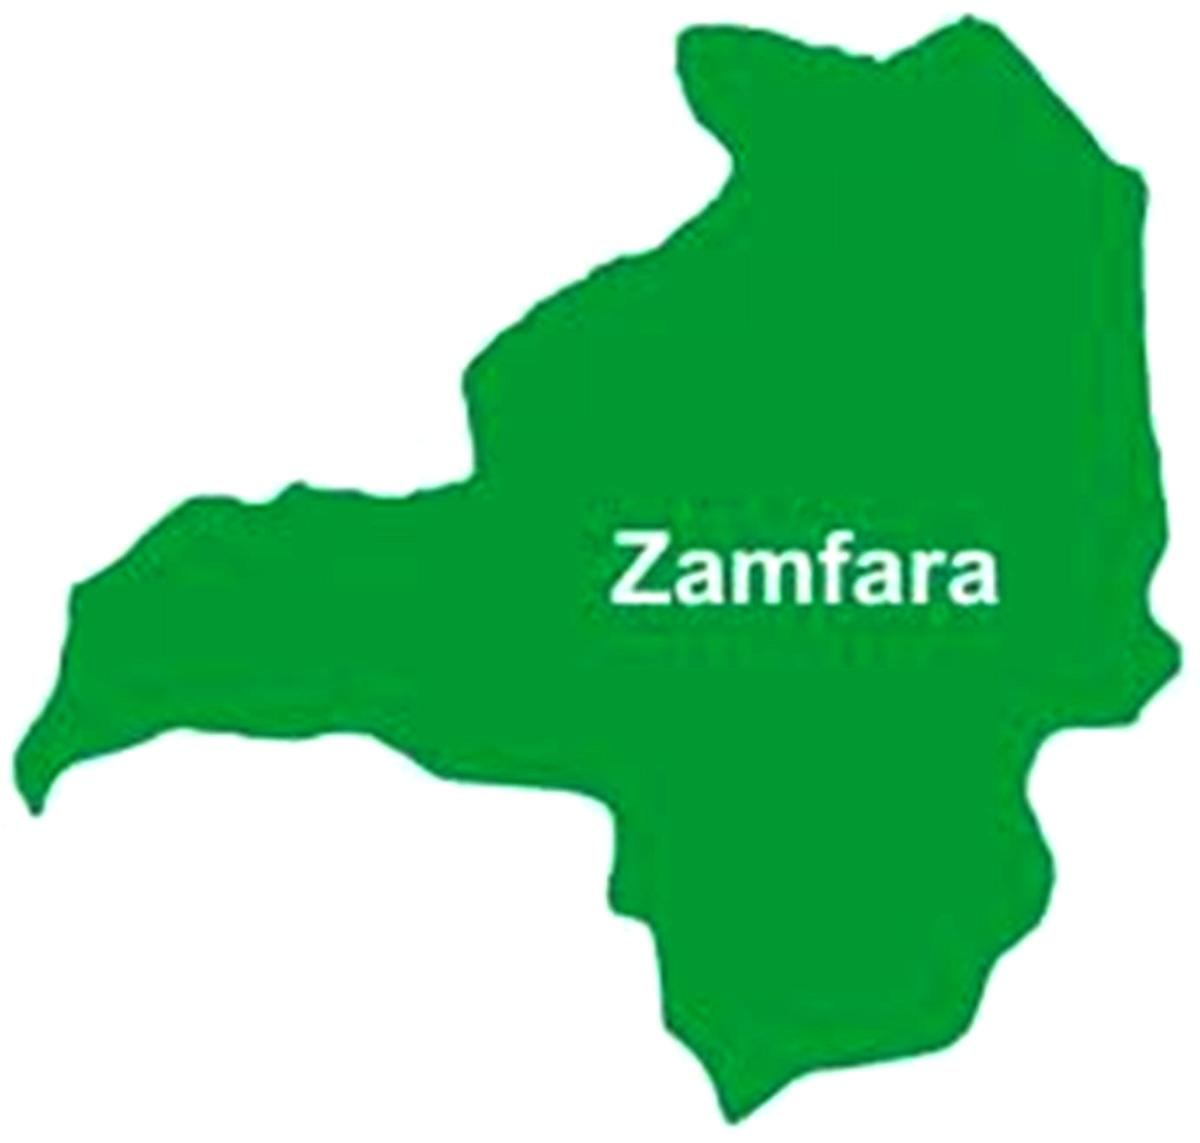 2 NYSC members kidnapped in Zamfara